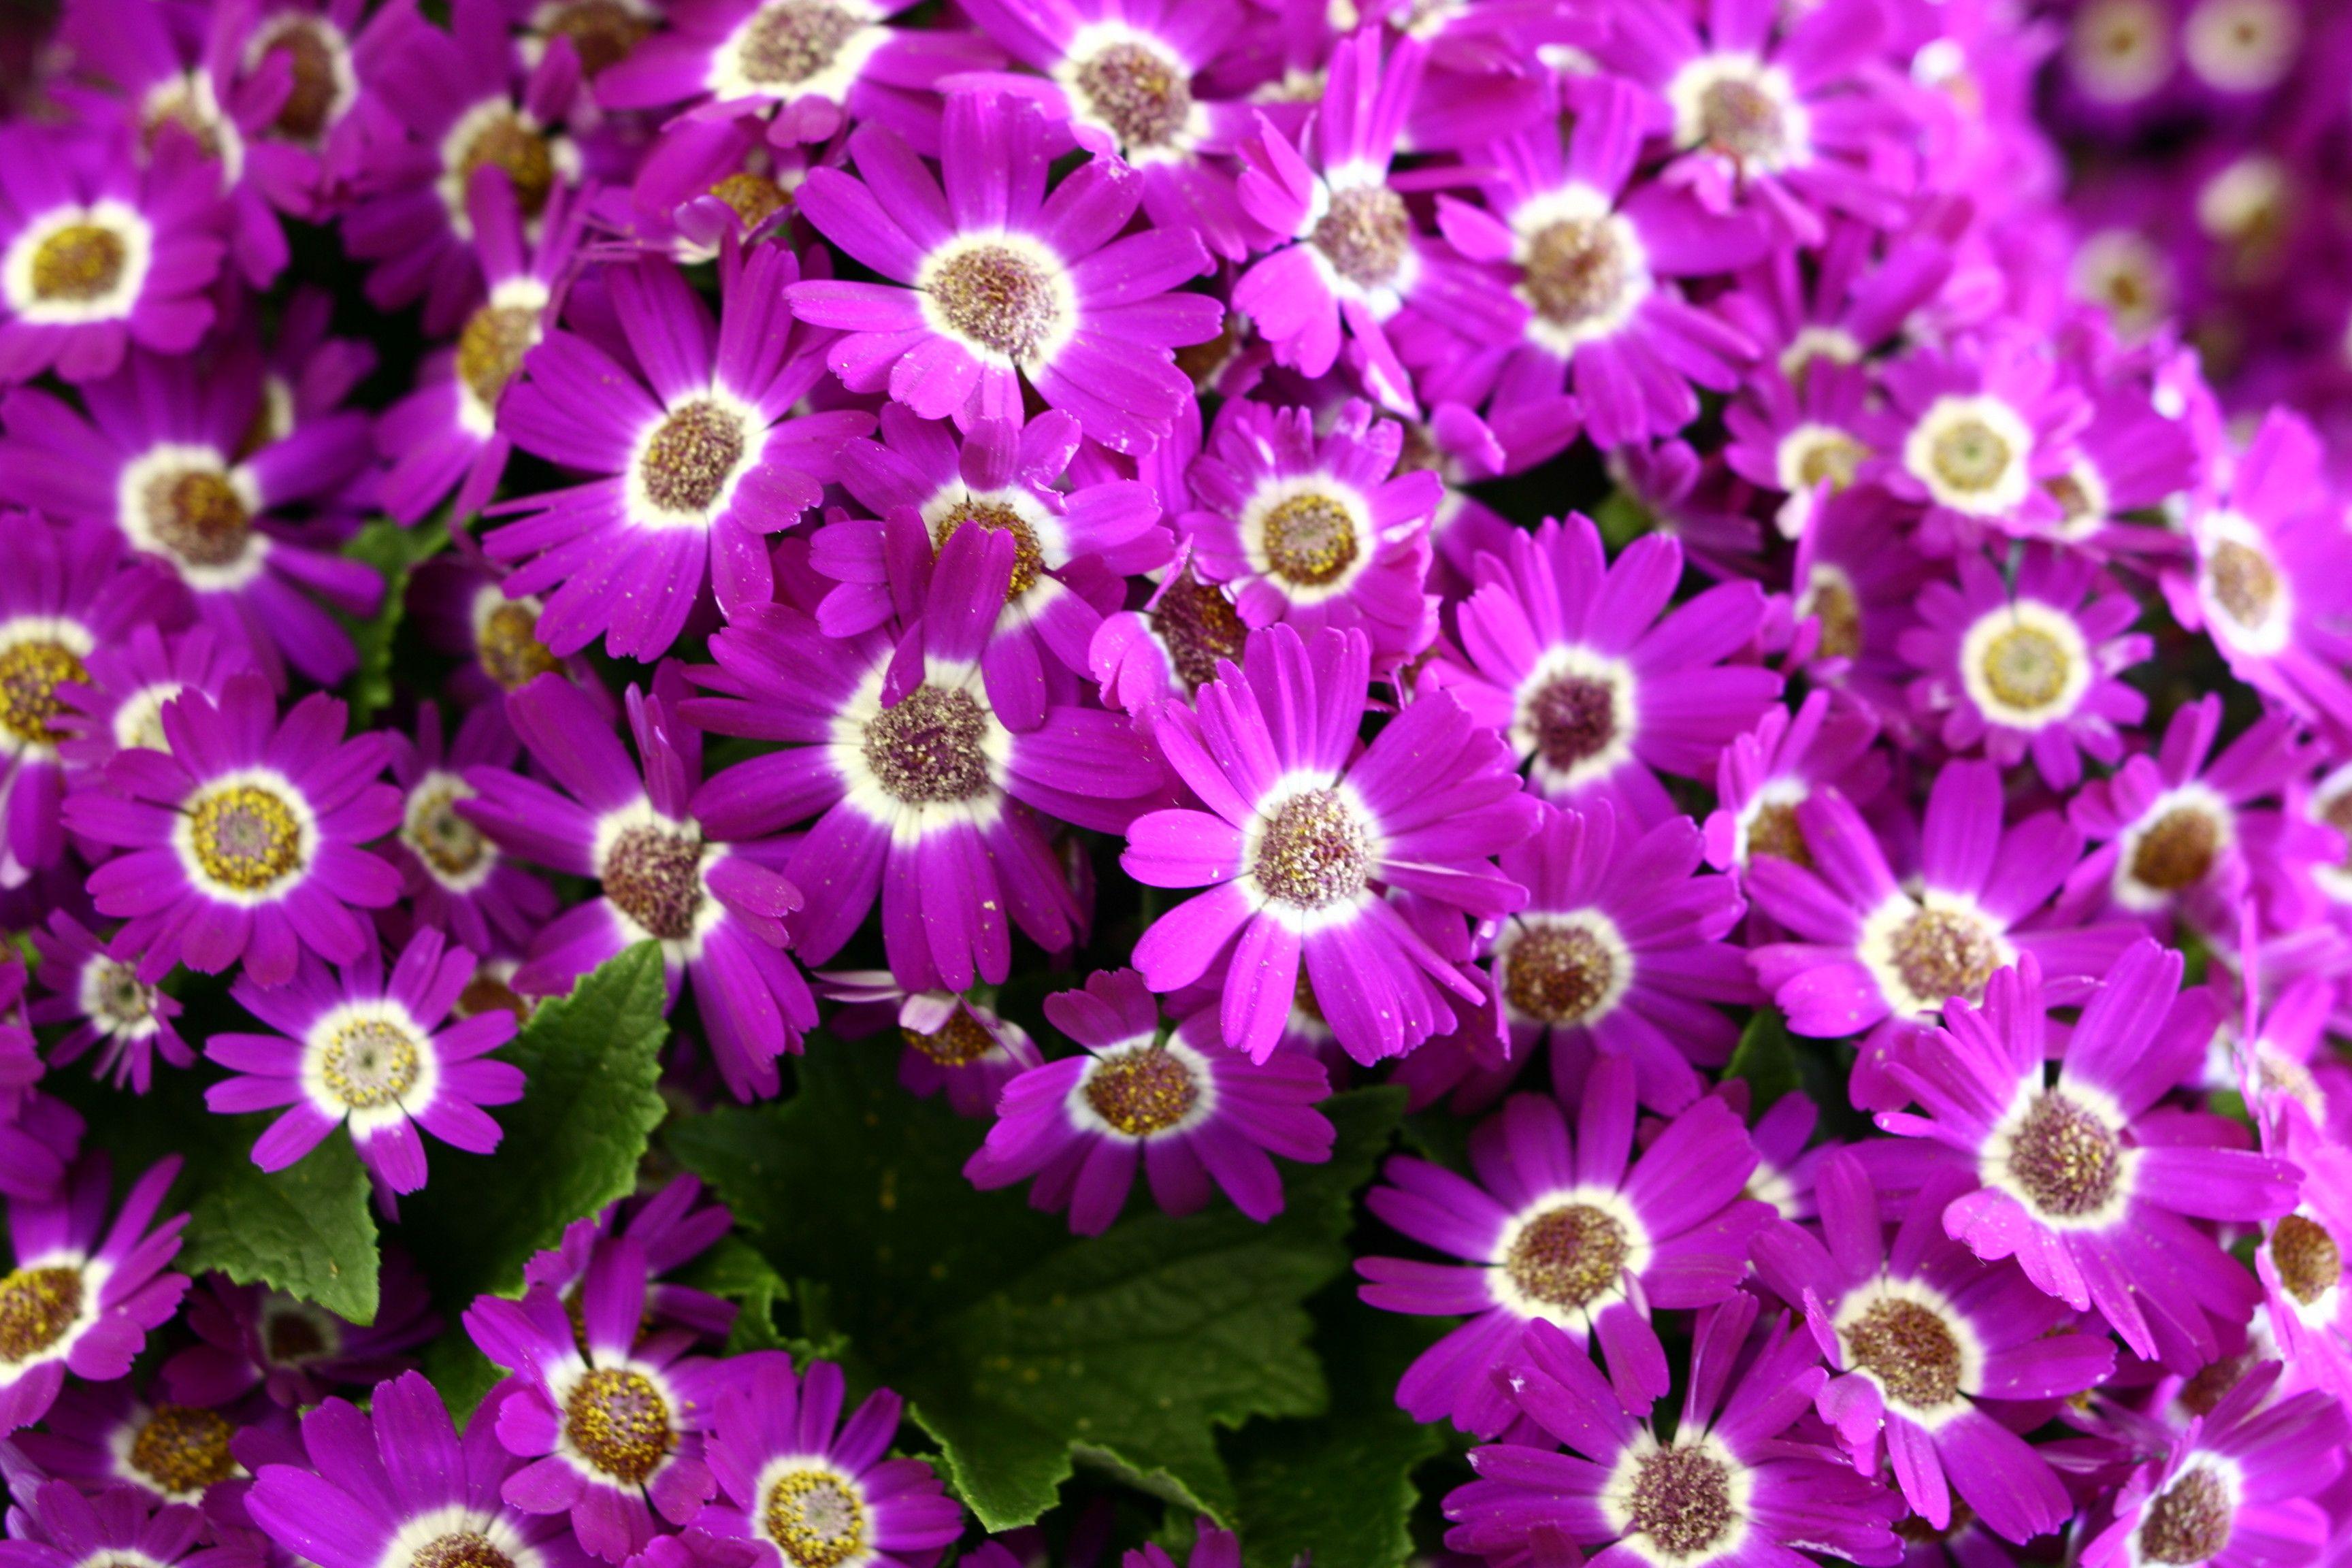 Violet Flori De Primavara Wallpaper Spring Flowers Image Free